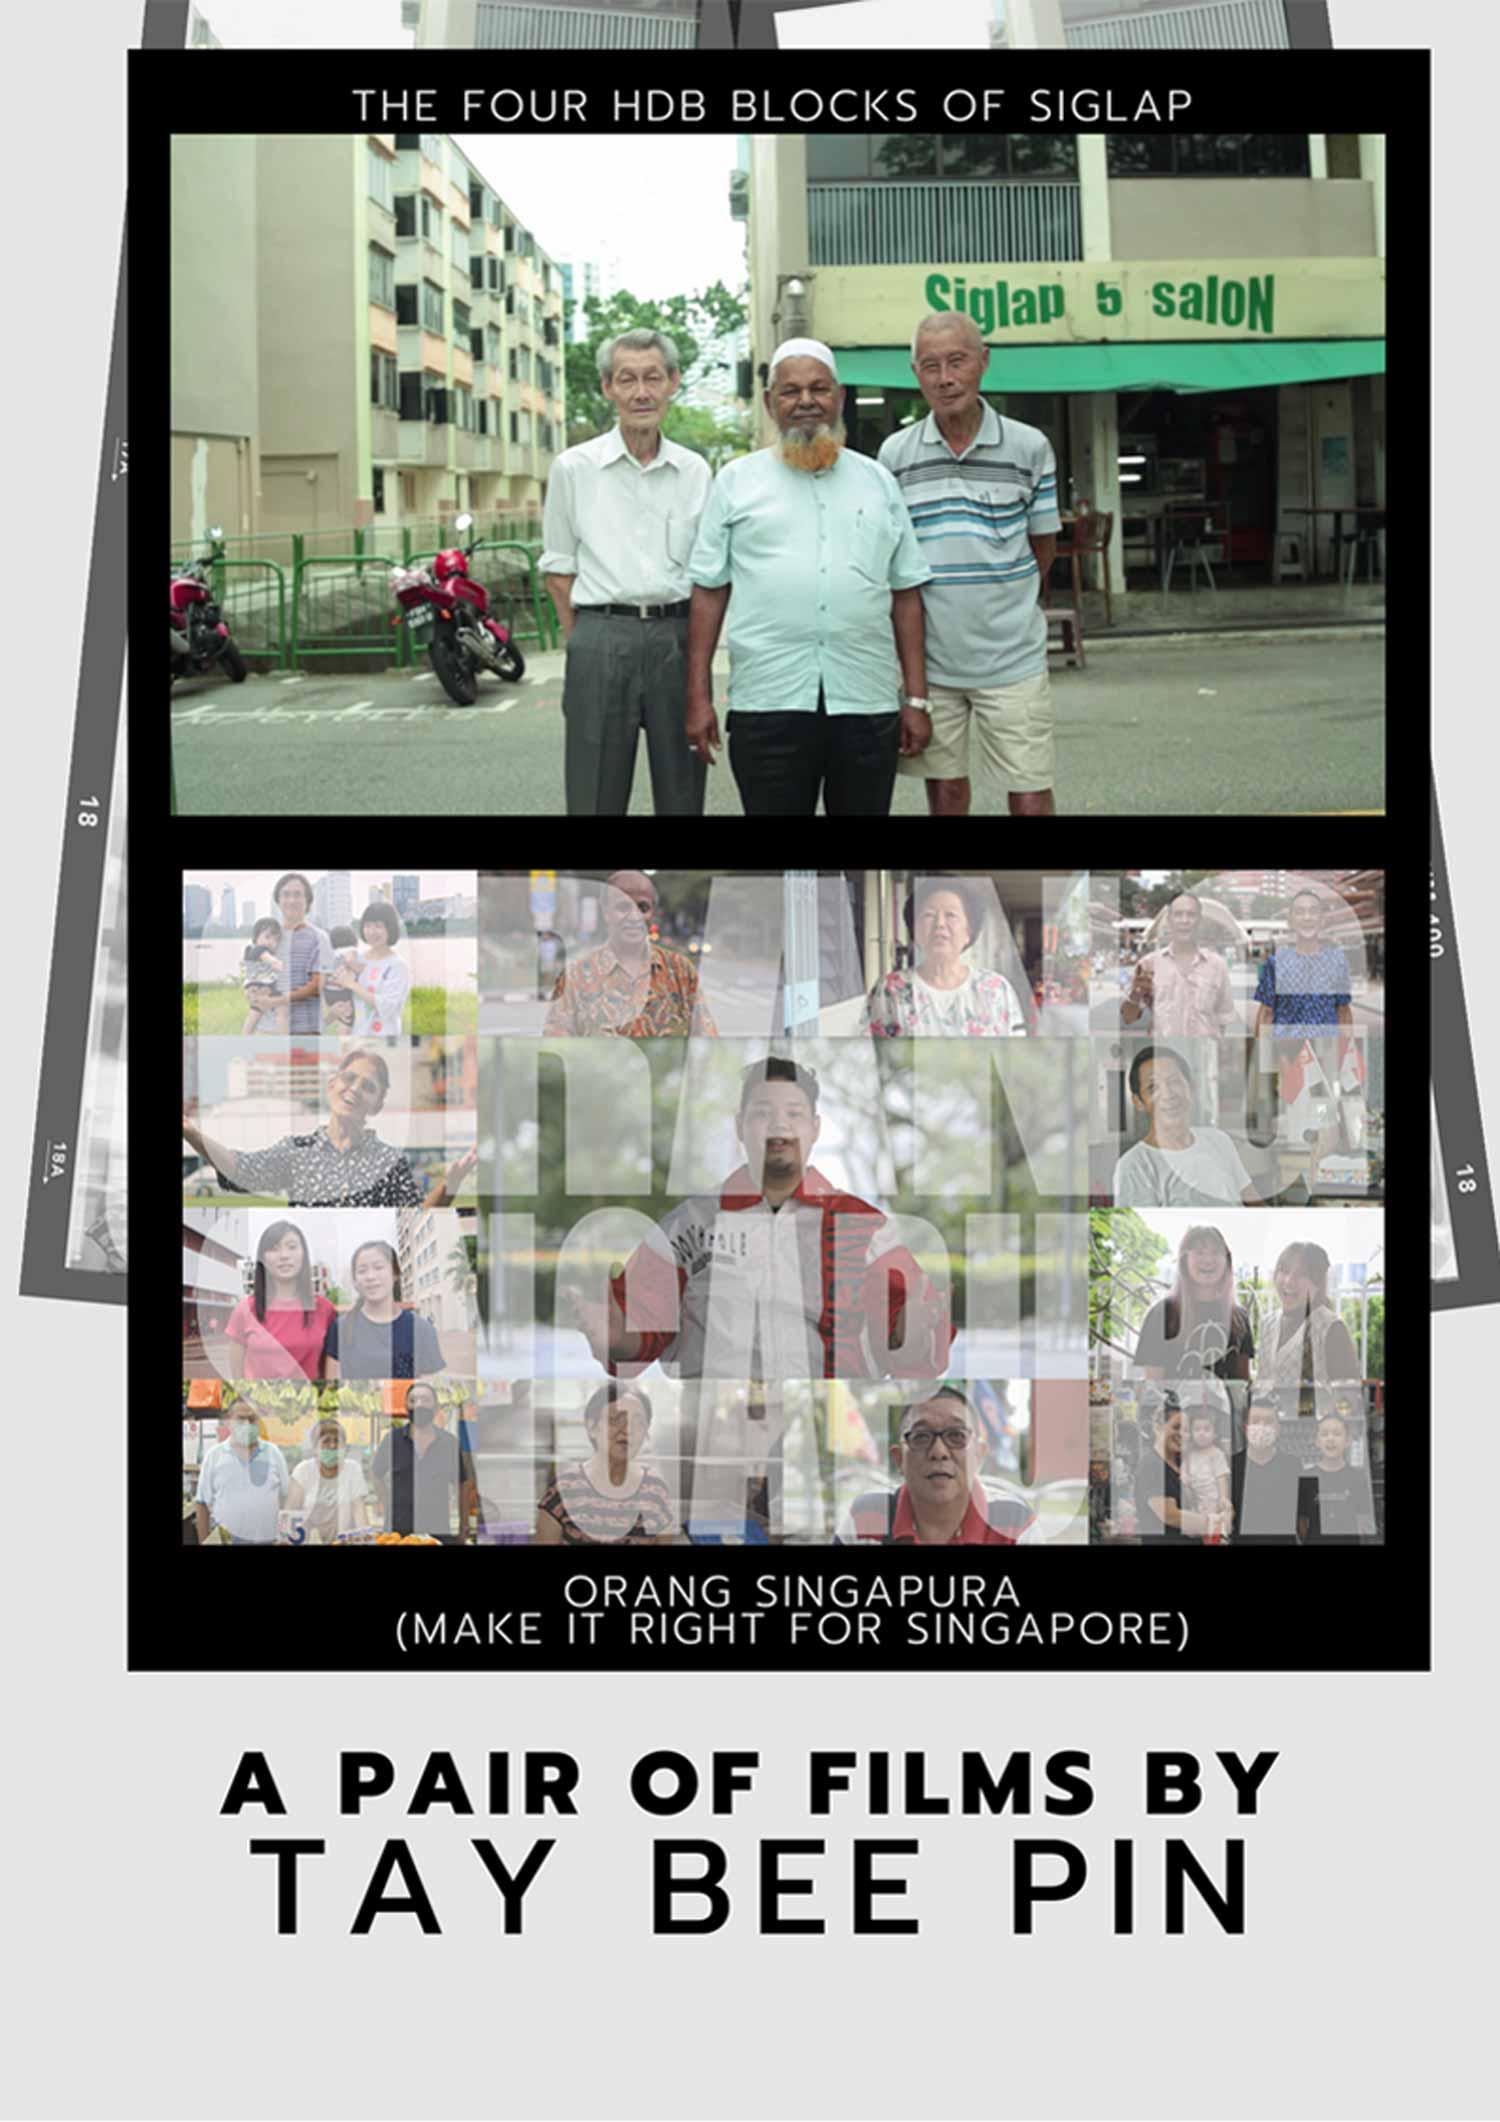 The Four HDB Blocks of Siglap + Orang Singapura (FreedomFilmFest 2020)